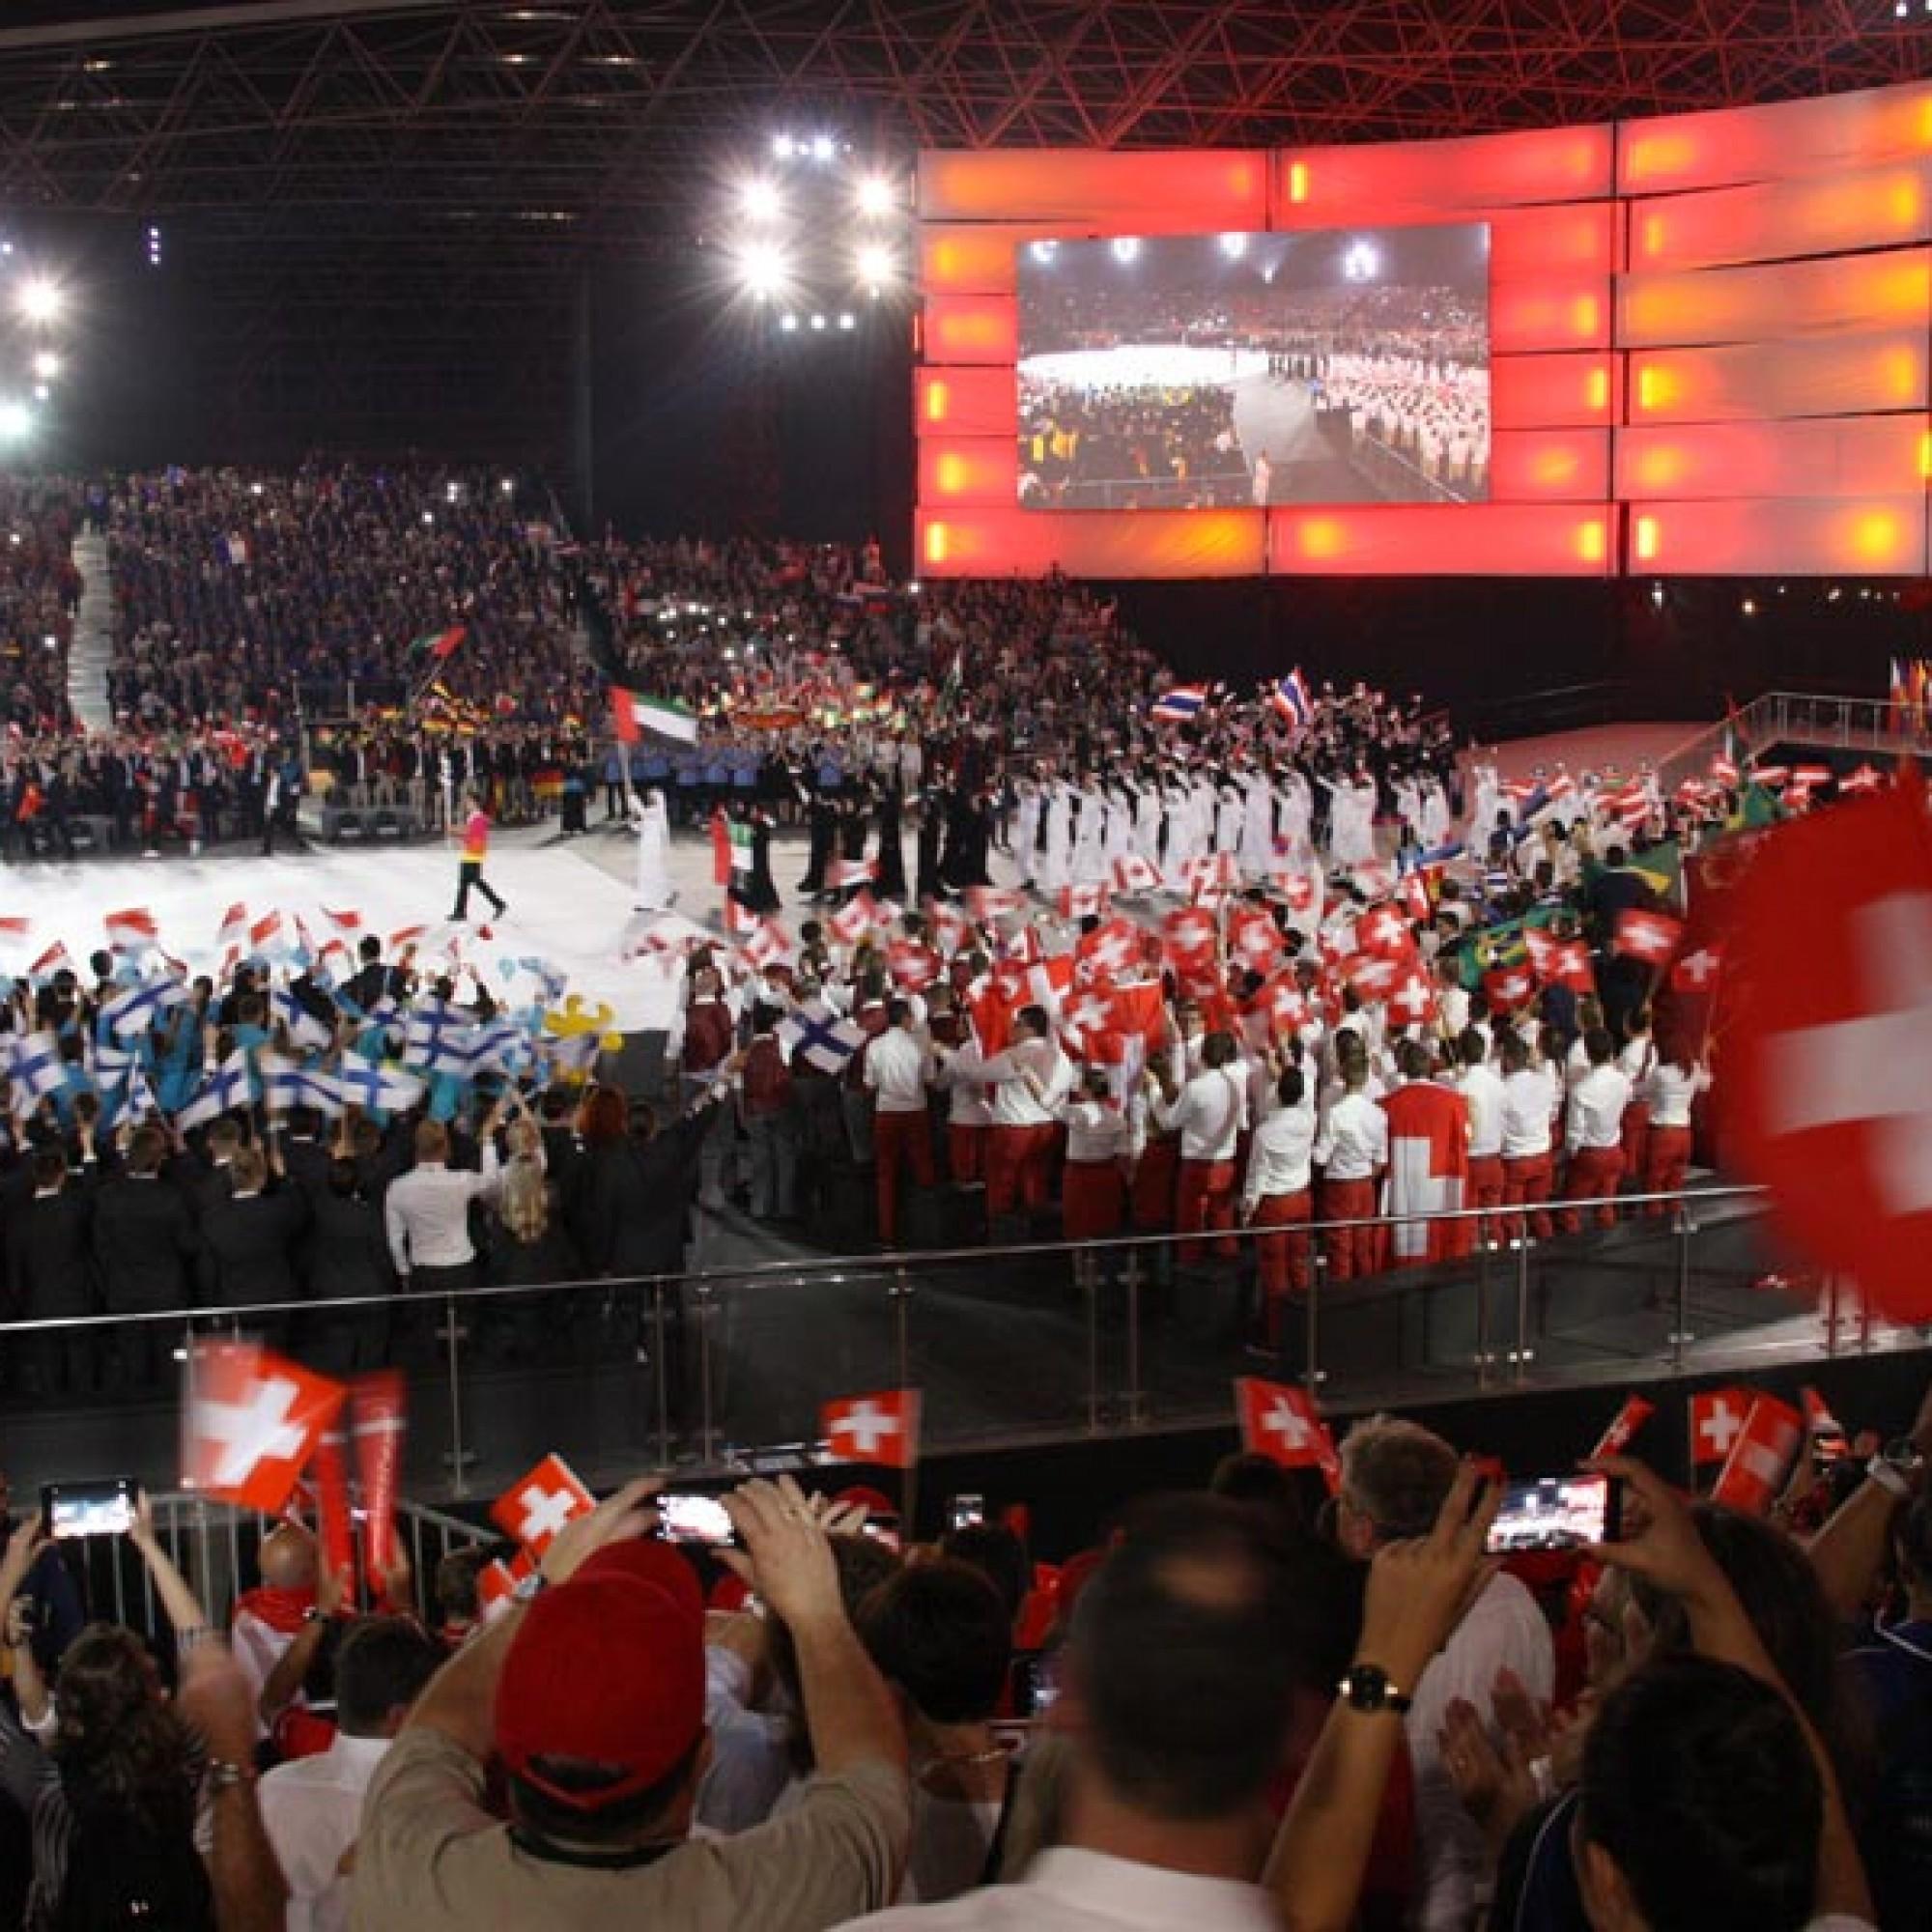 Eröffnungsfeier der Worldskills in Abu Dhabi am Samstag.